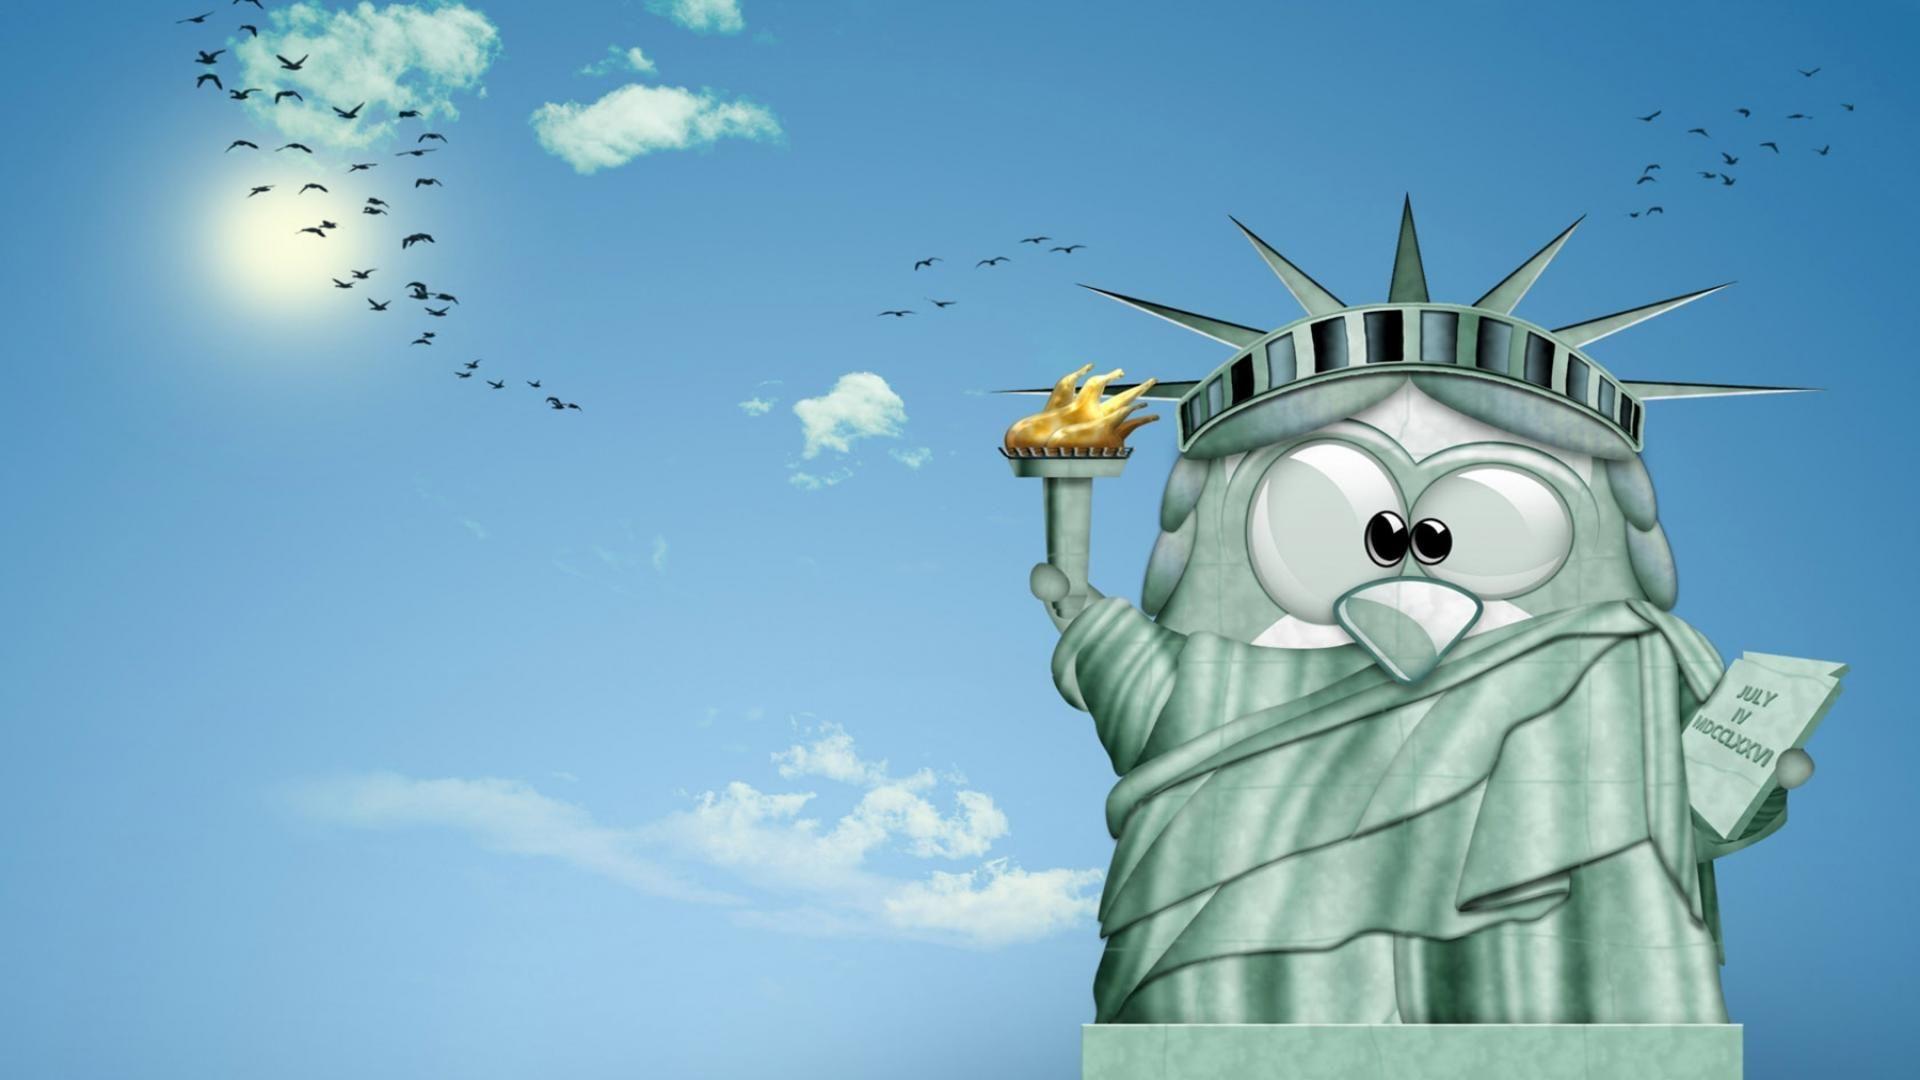 funny penguin liberty wallpaper hd | cartoon | pinterest | cartoon